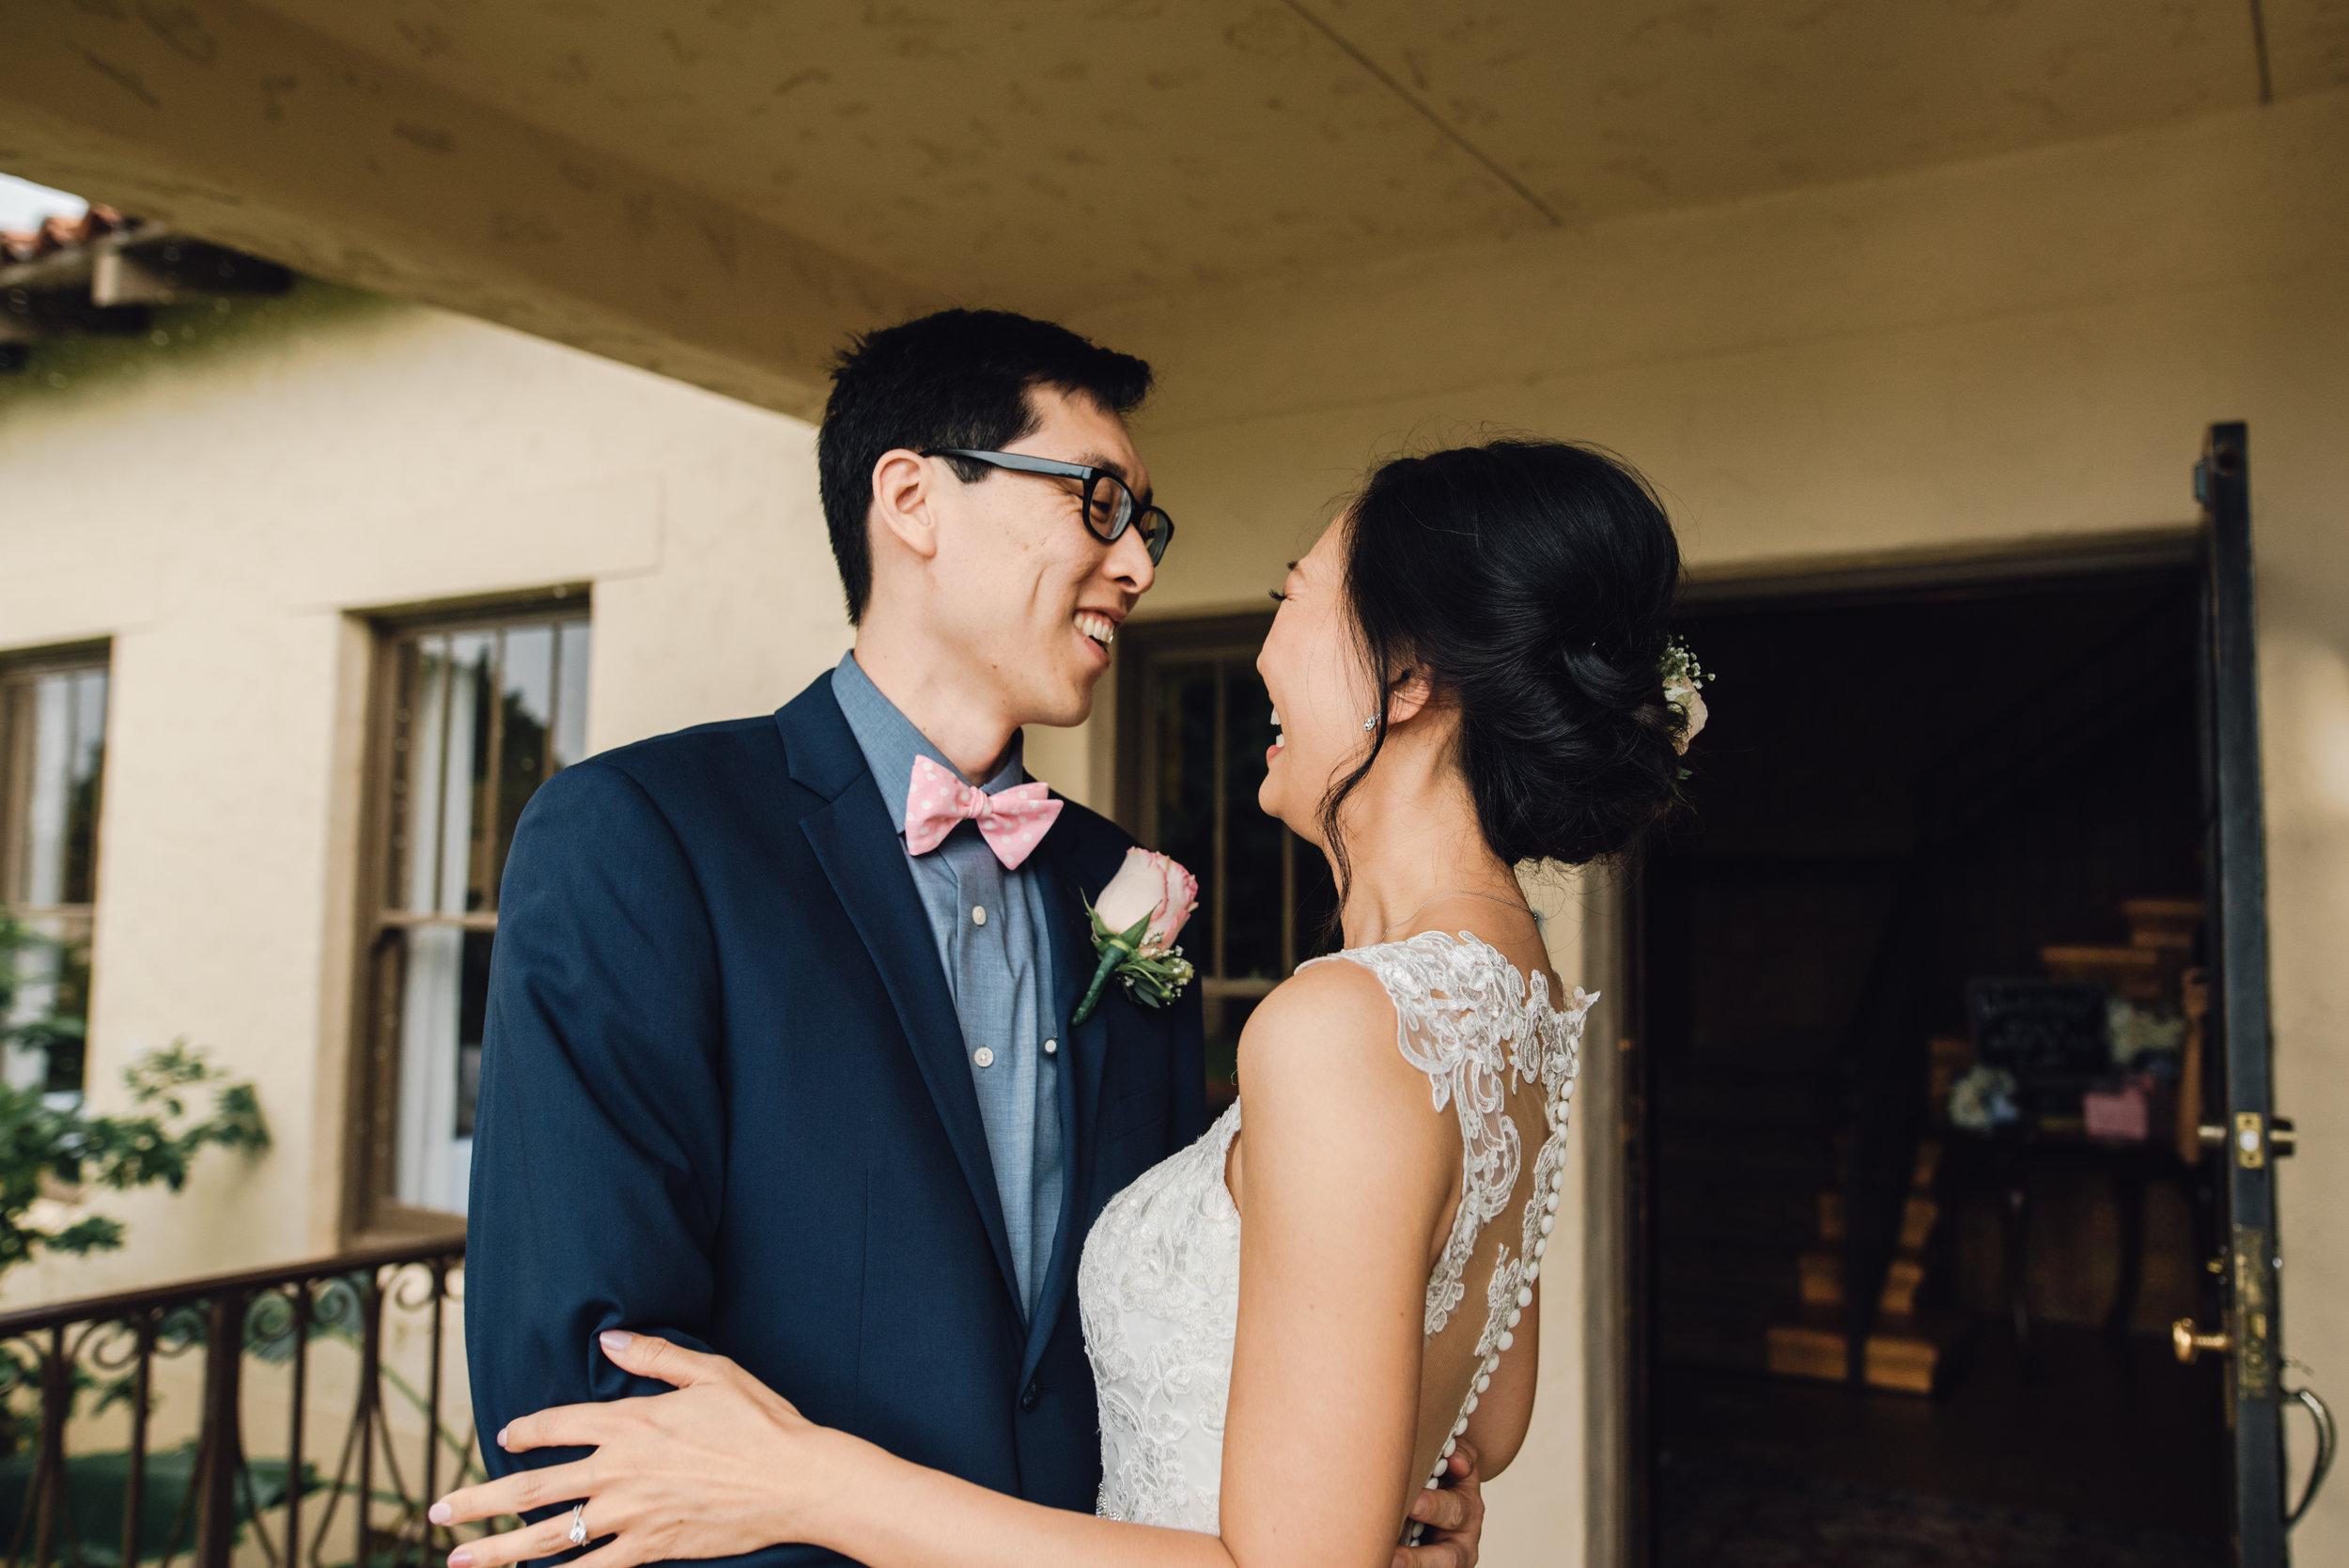 Main and Simple Photography_2016_Wedding_AZ_J+S_BLOG-53.jpg